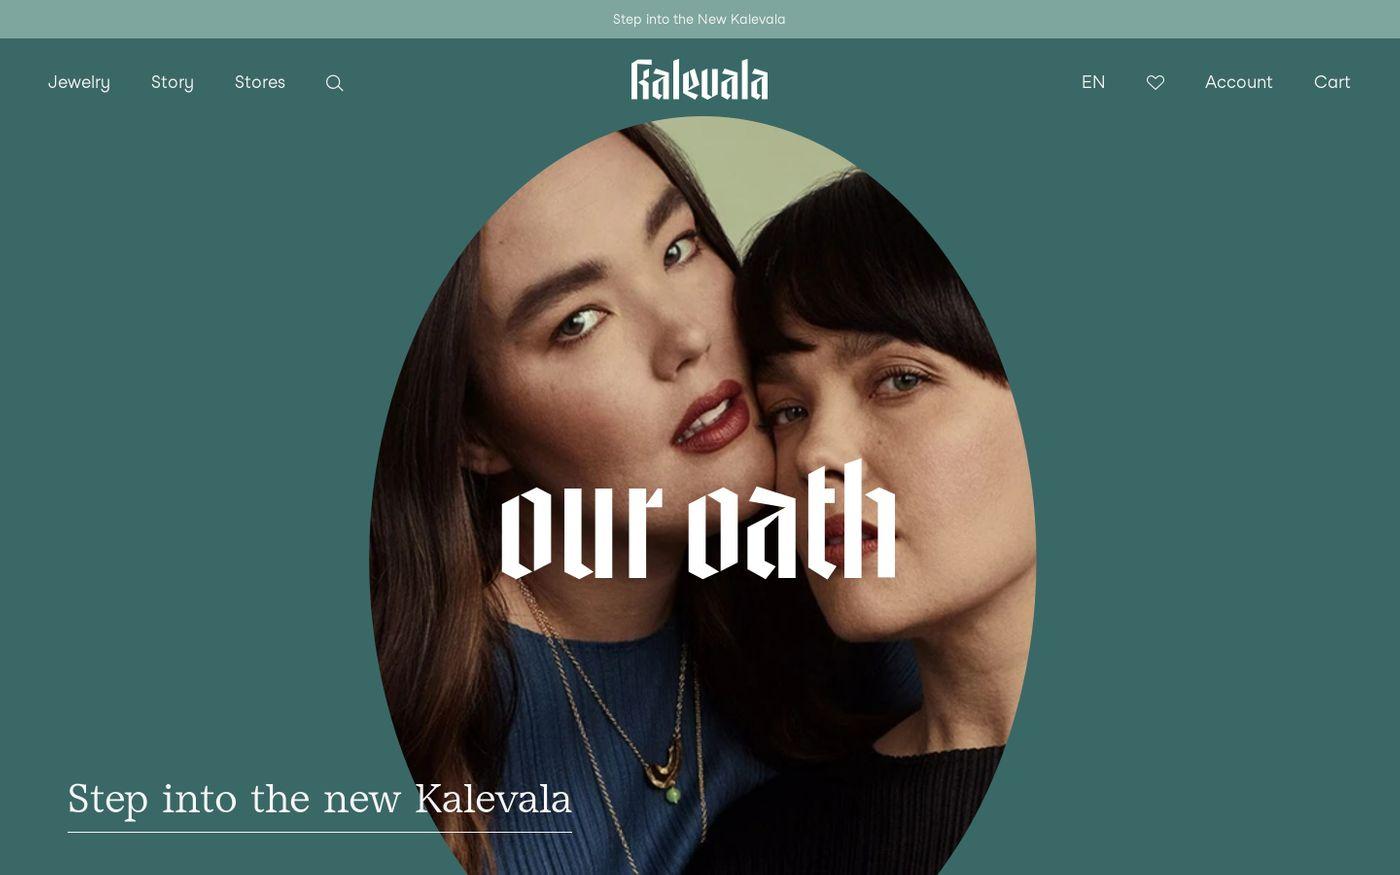 Screenshot of Kalevala website